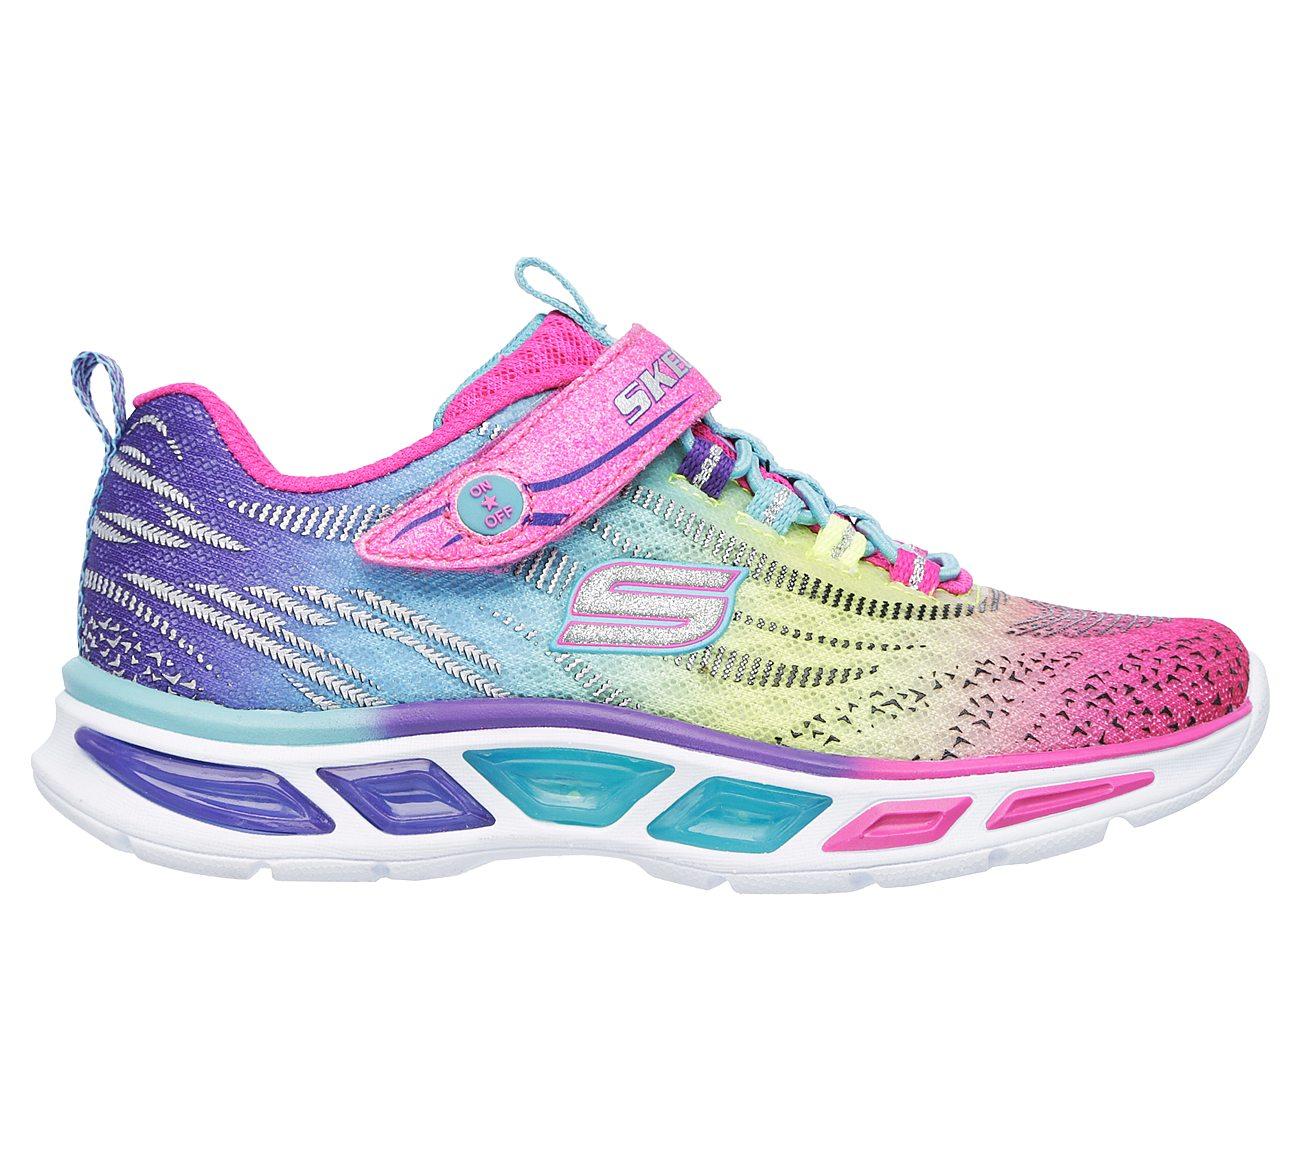 Litebeams SKECHERS S-Lights Shoes